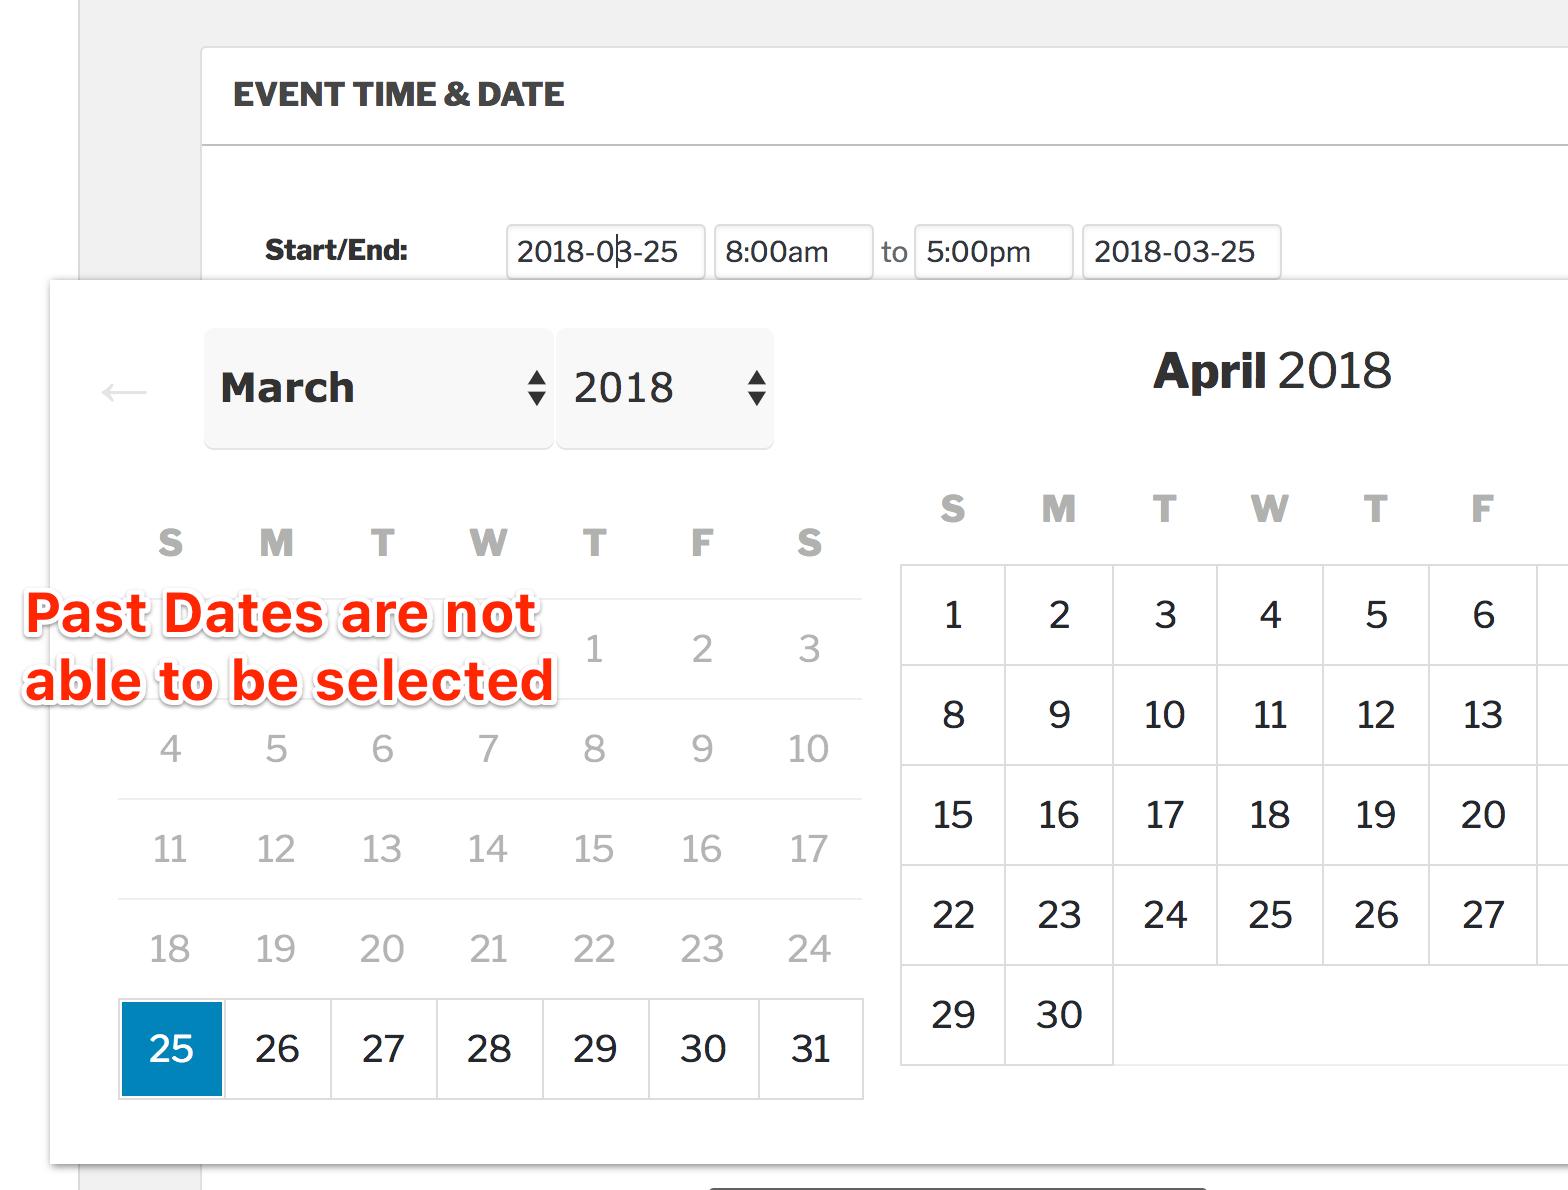 Custom Datepicker Start Date | The Events Calendar